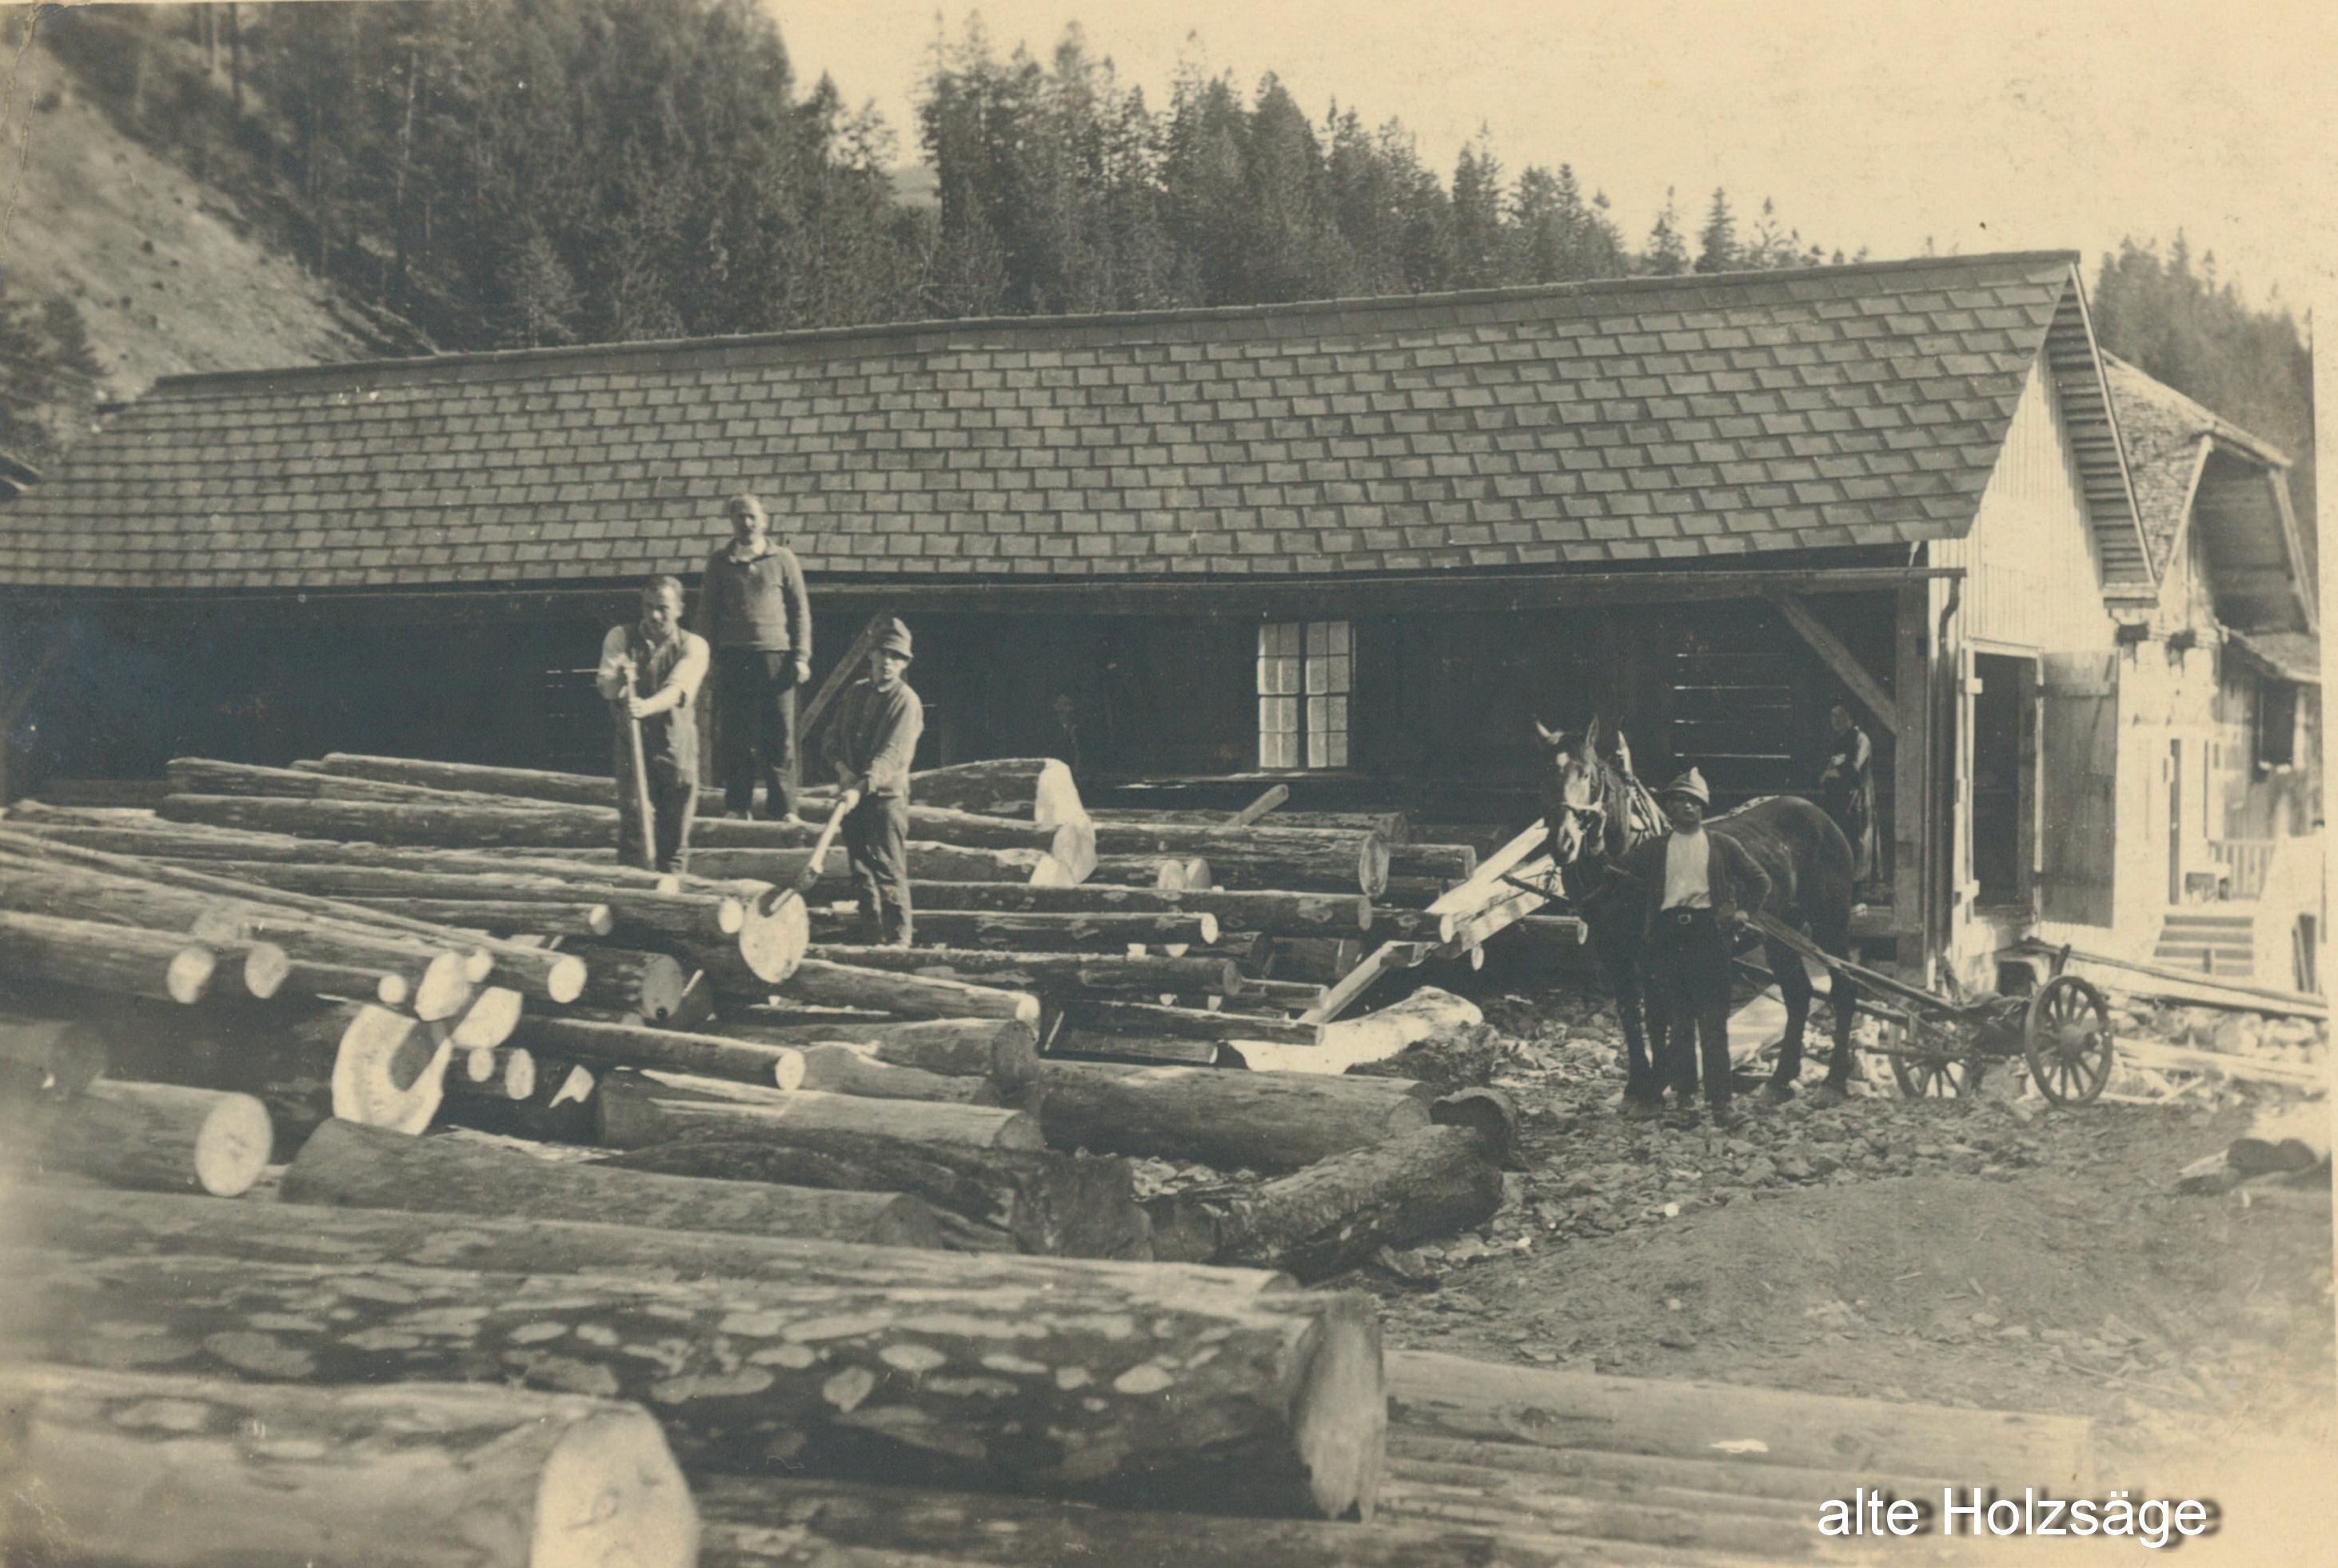 alte Holzsäge.jpg